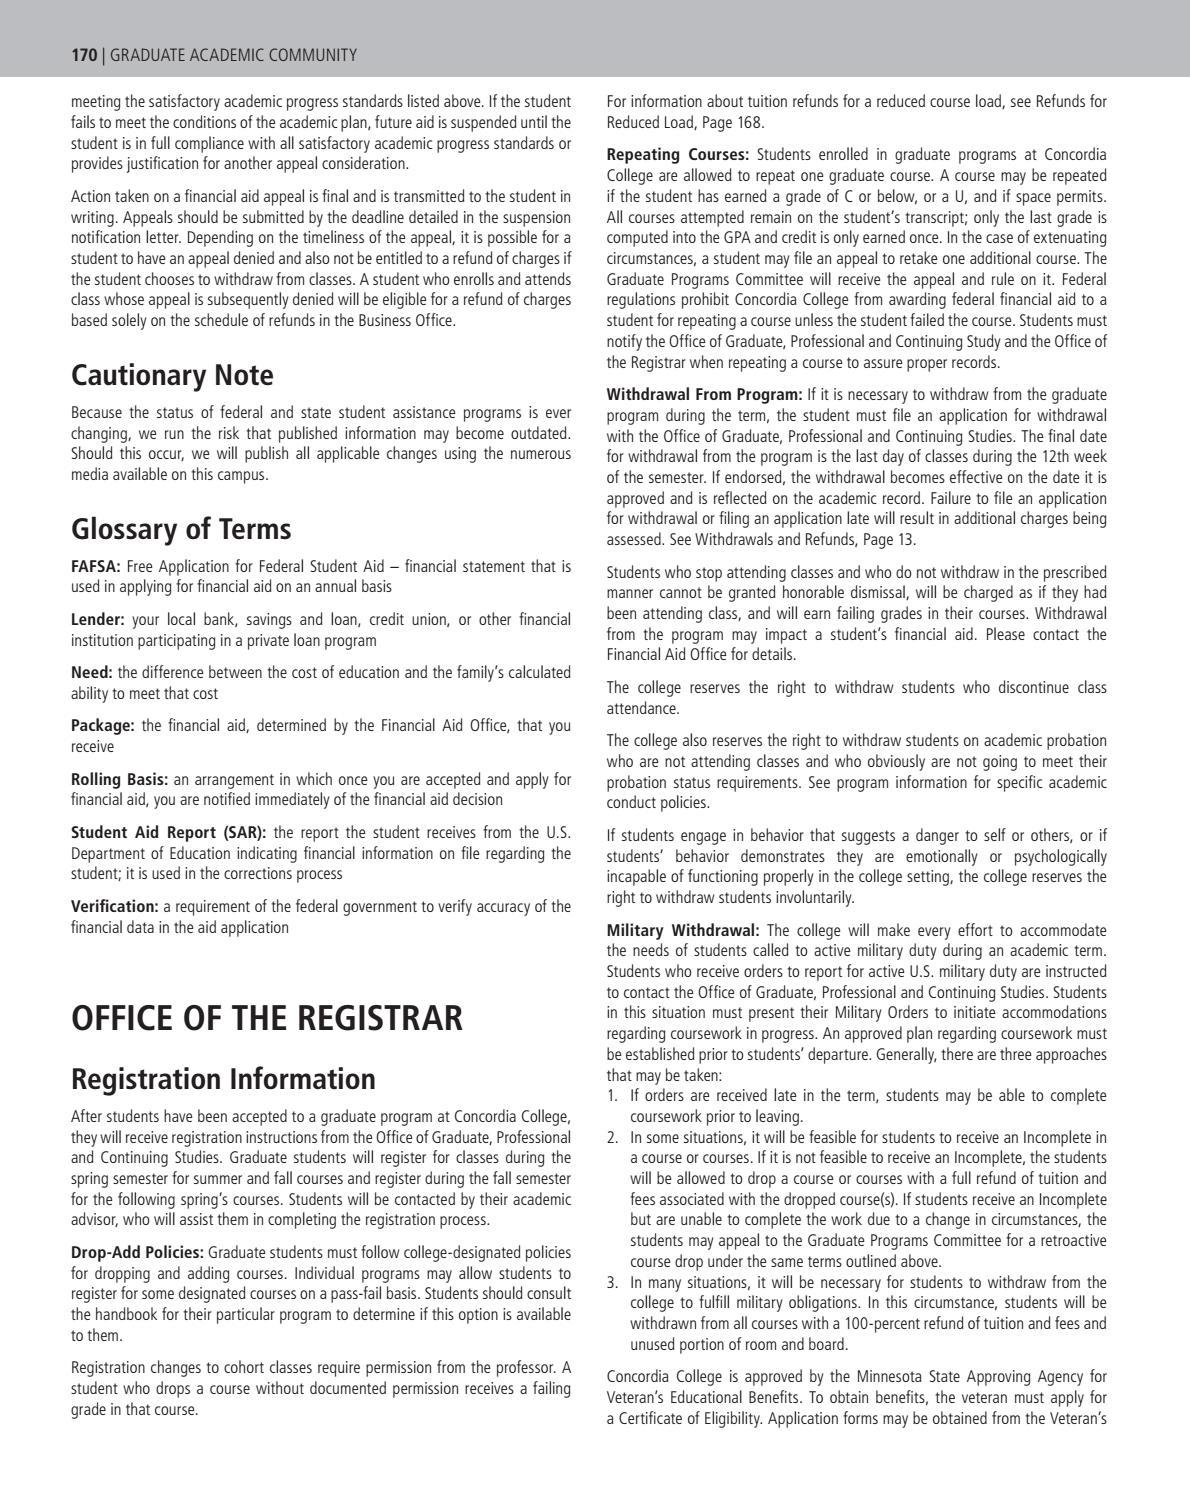 Academic Catalog 2017 18 By Concordia College